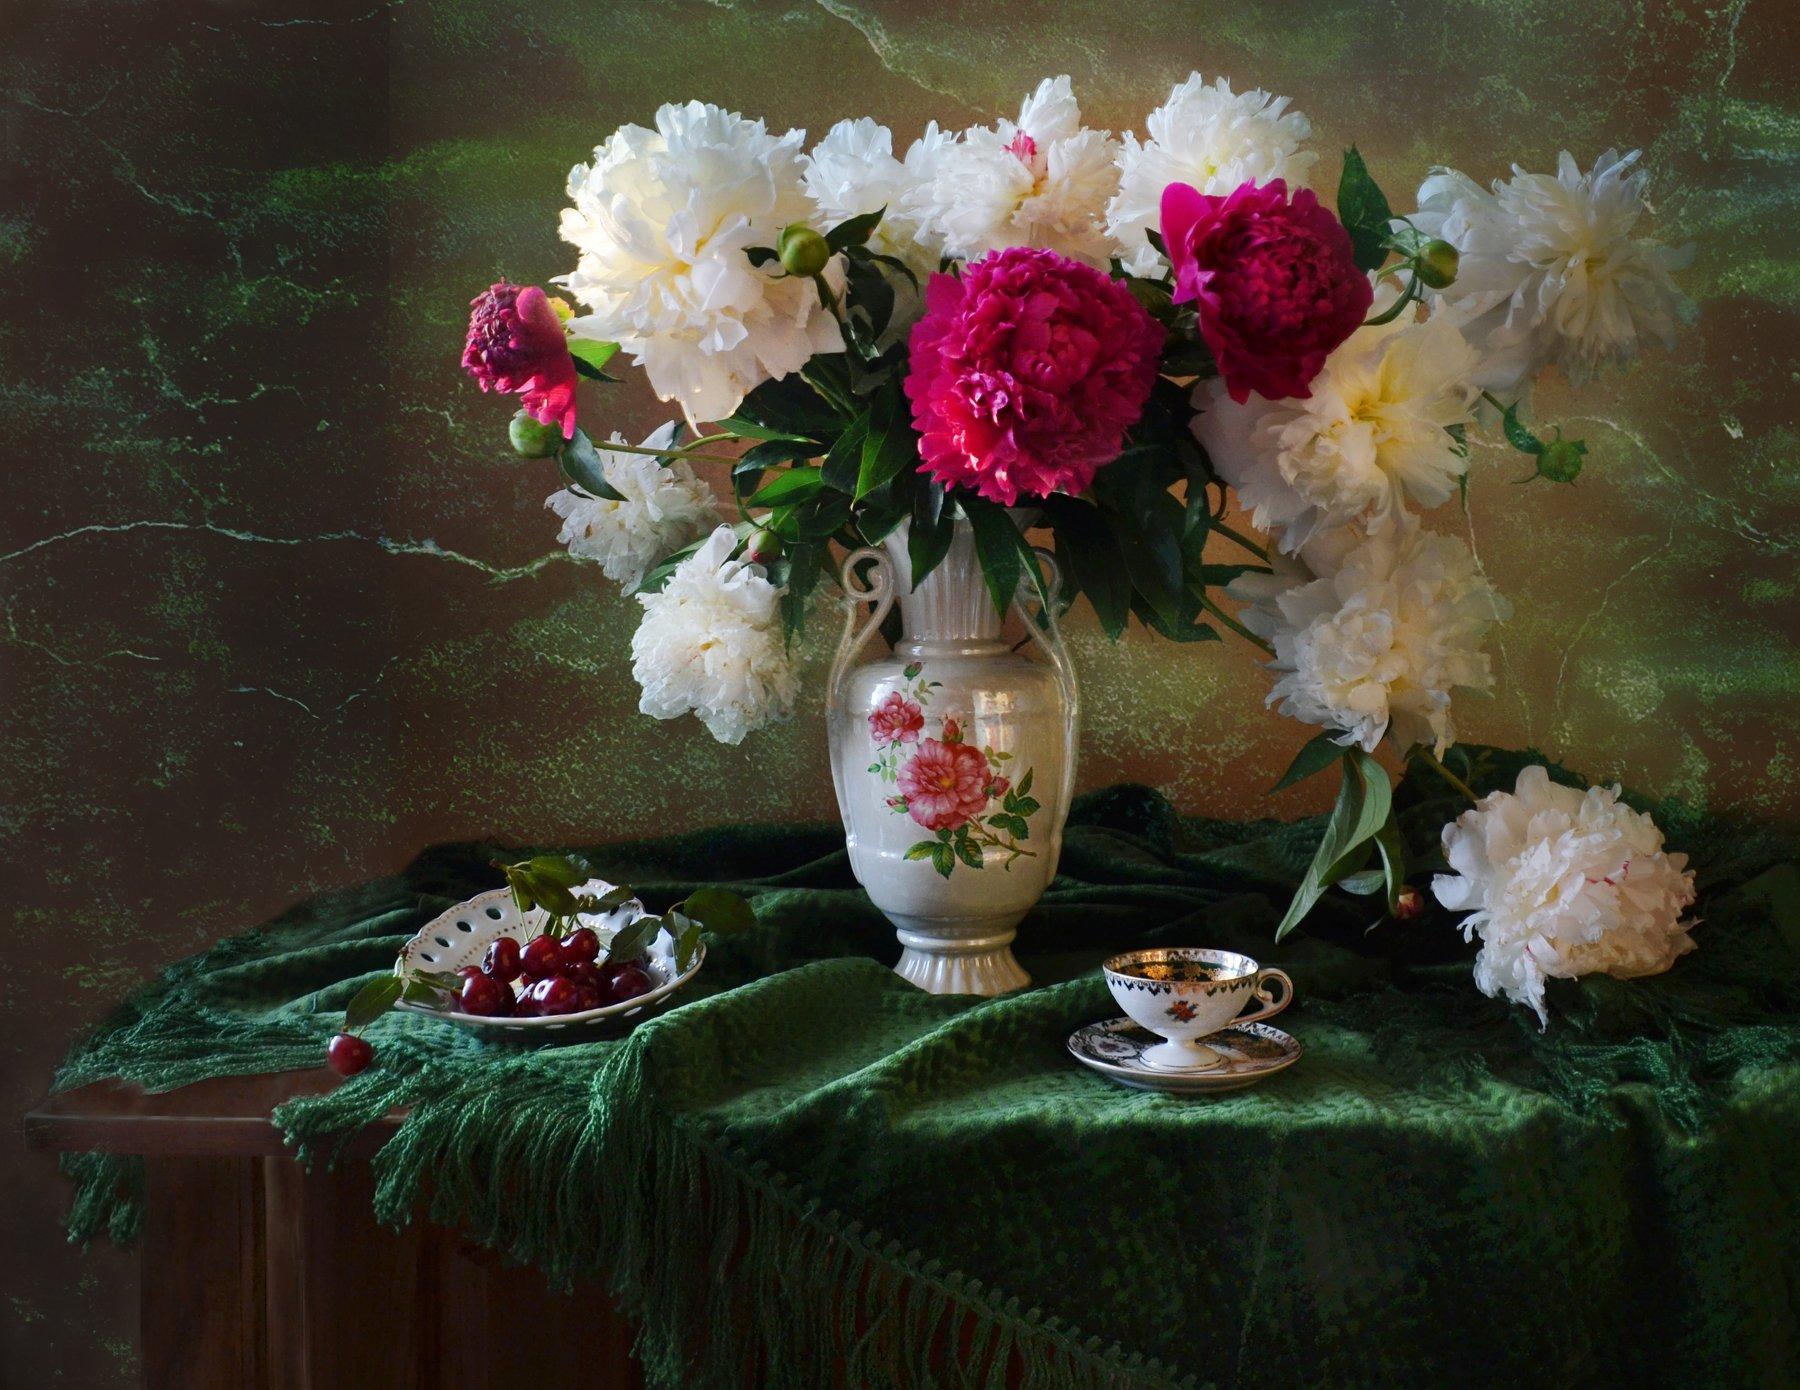 still life, натюрморт, вишня, фарфор, июль, лето, пионы, стихи, фото натюрморт, цветы, Колова Валентина